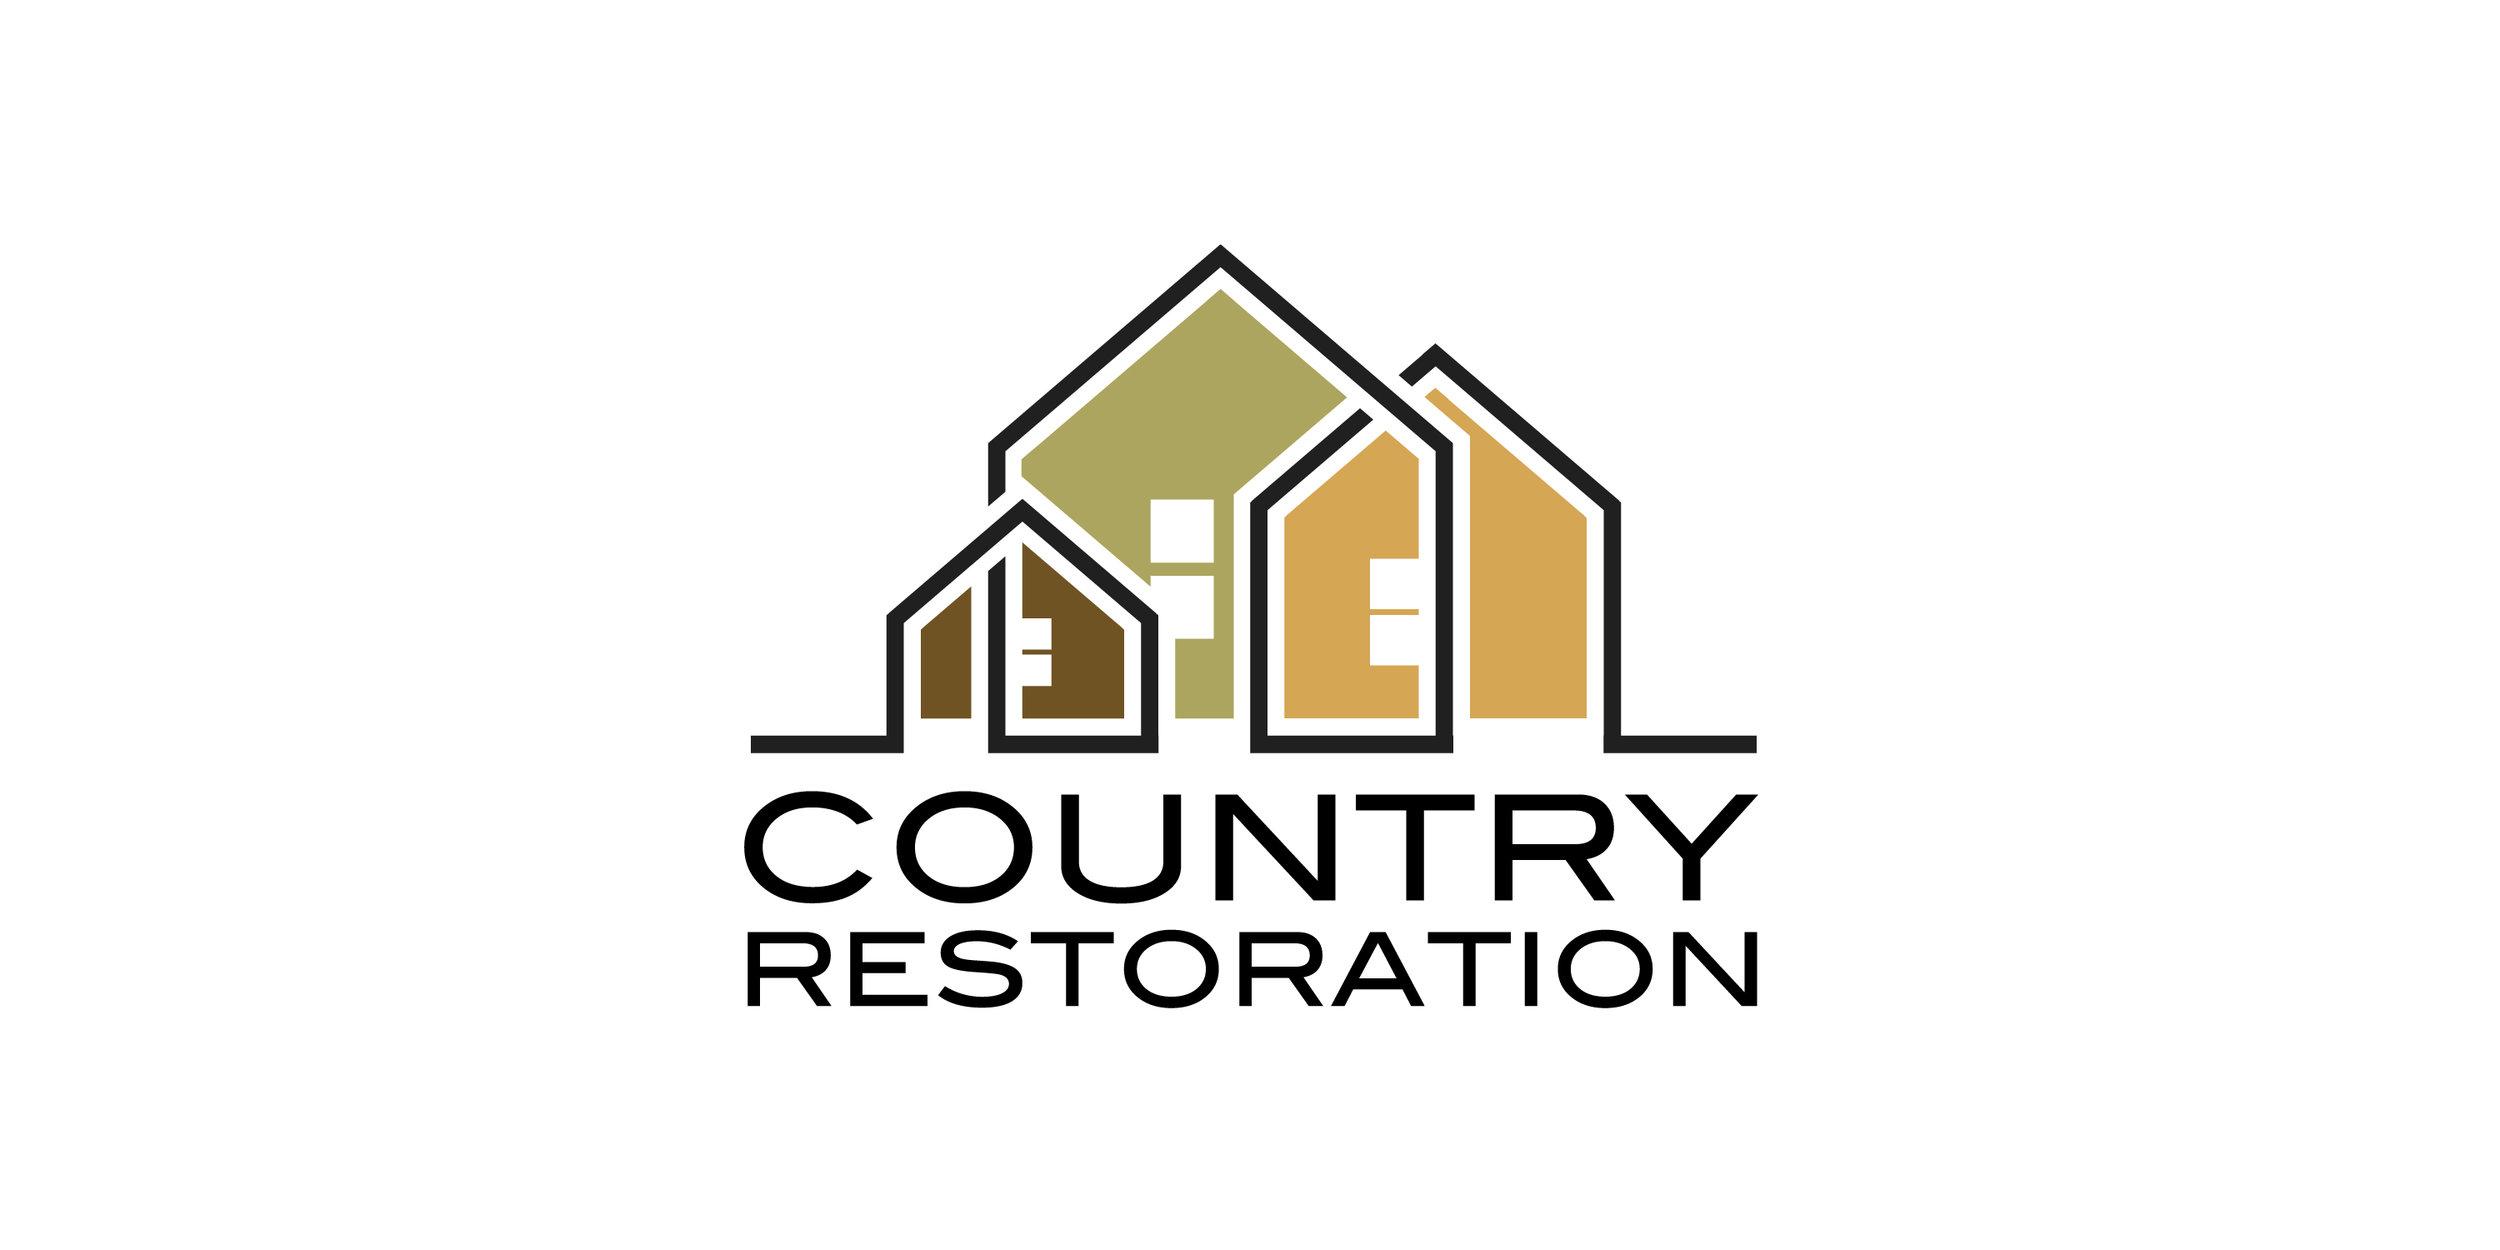 Country_Restoration_5.jpg